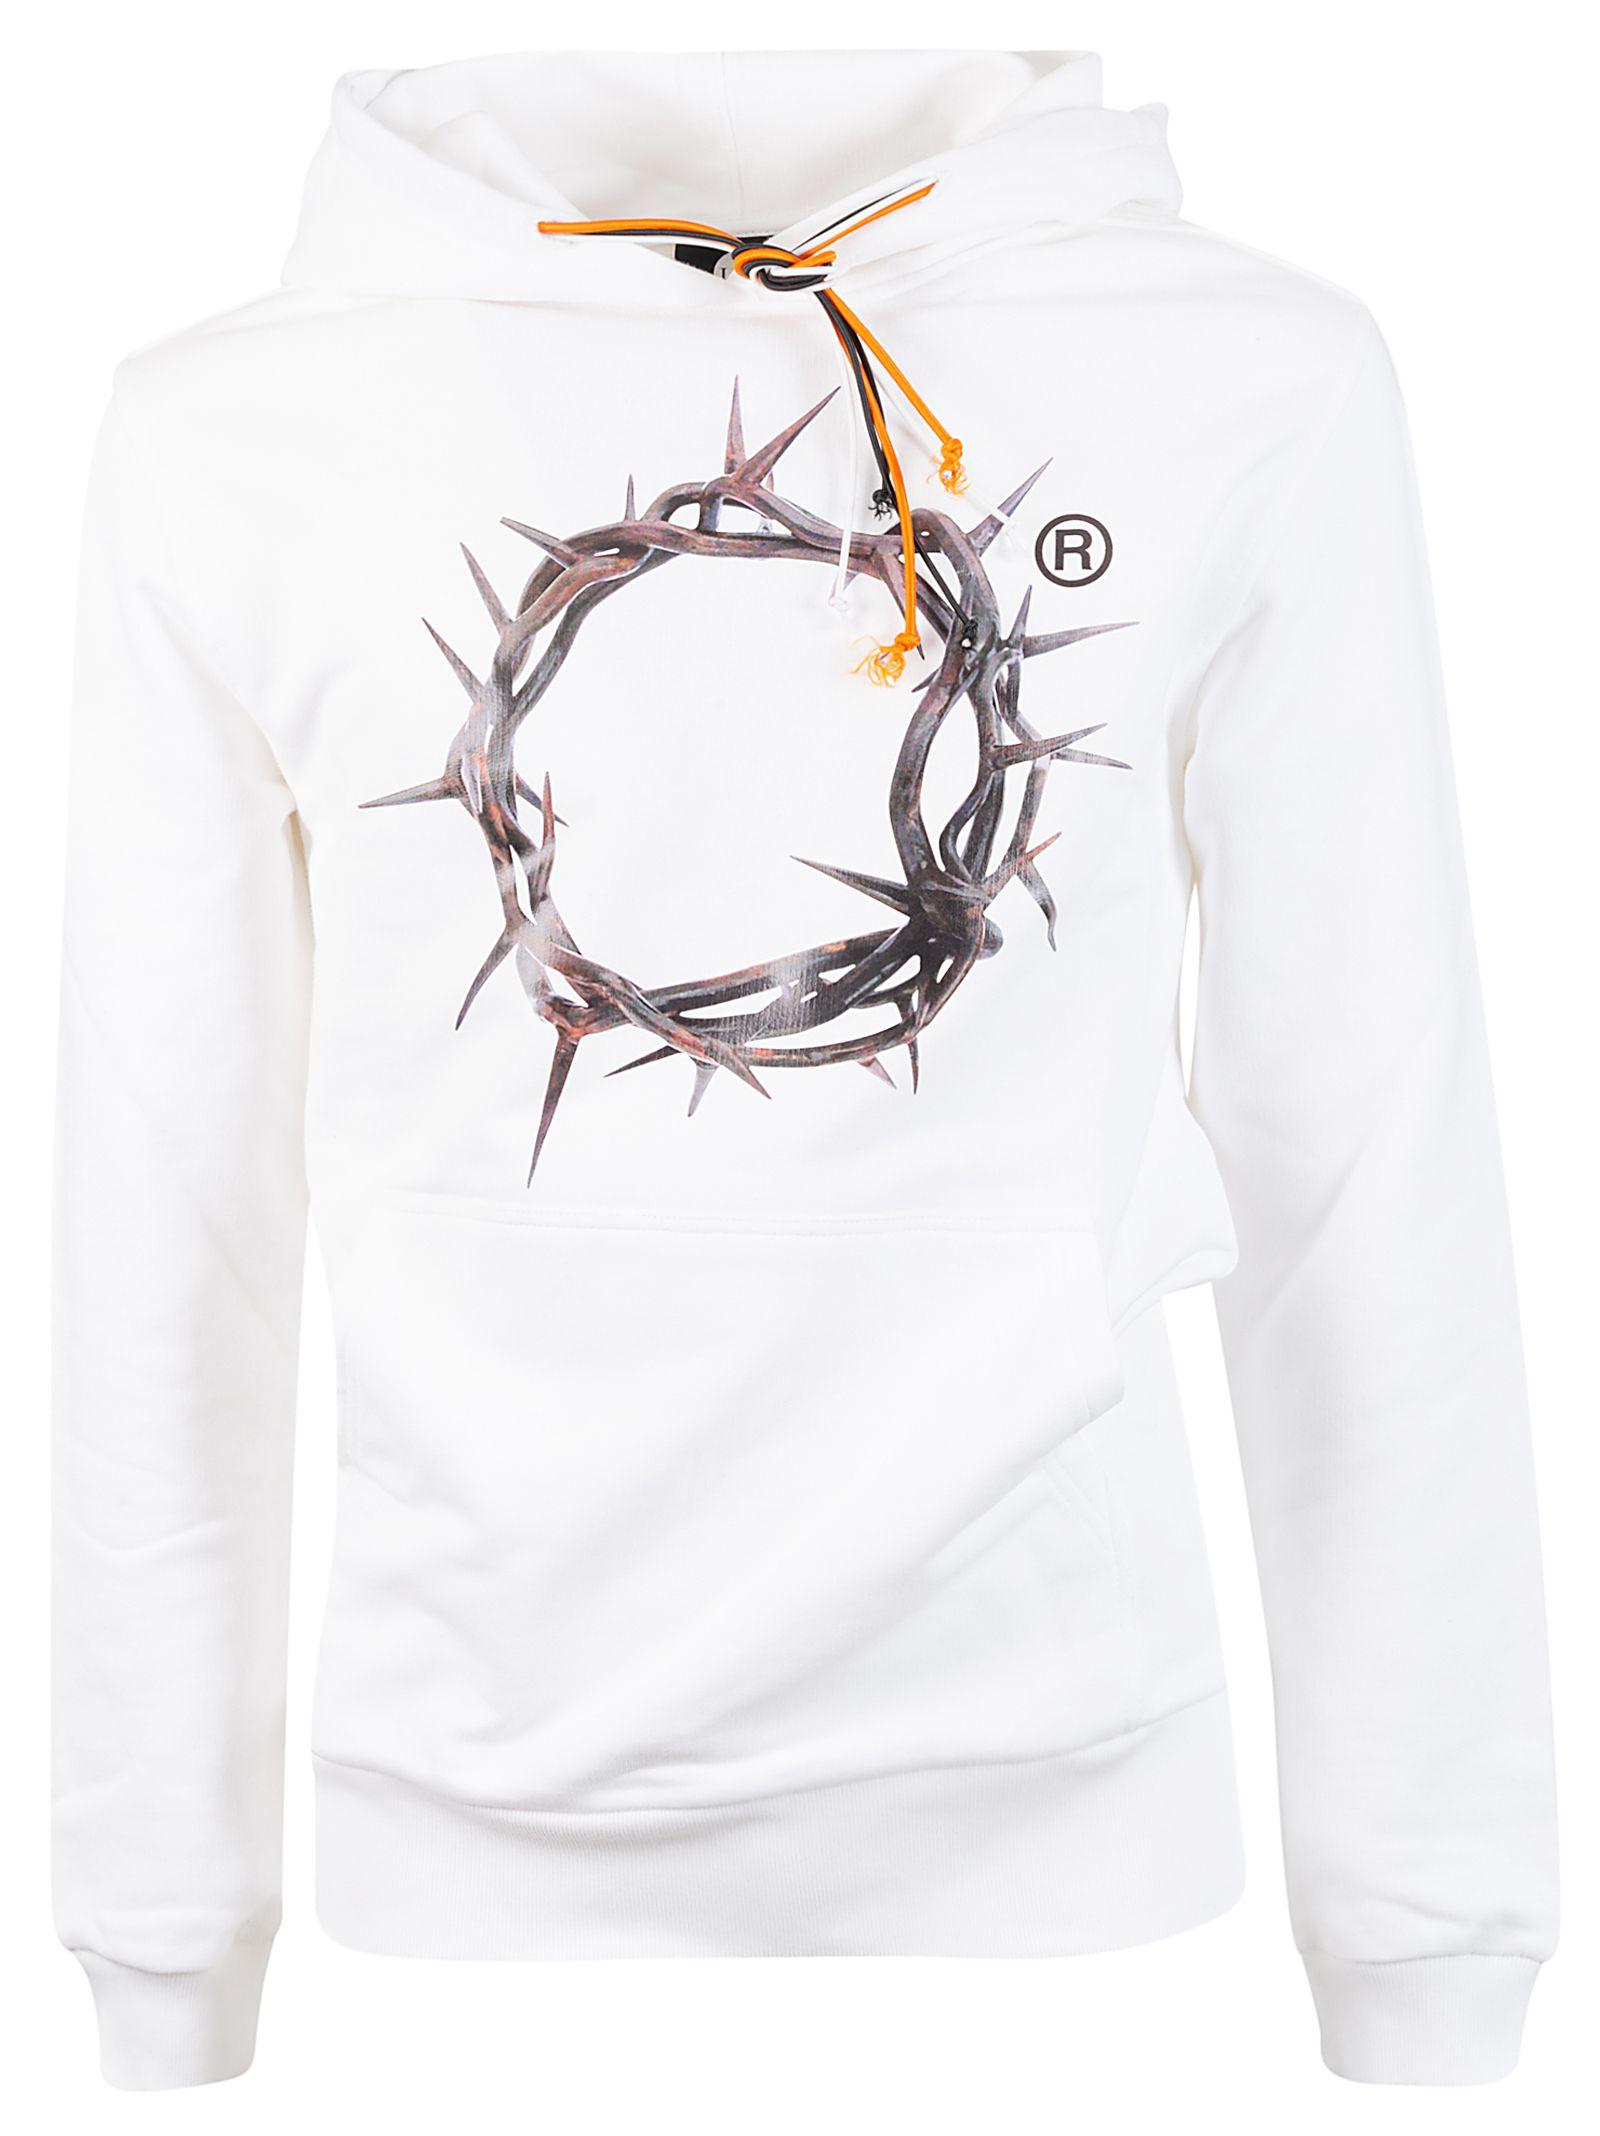 Ihs White Cotton Sweatshirt